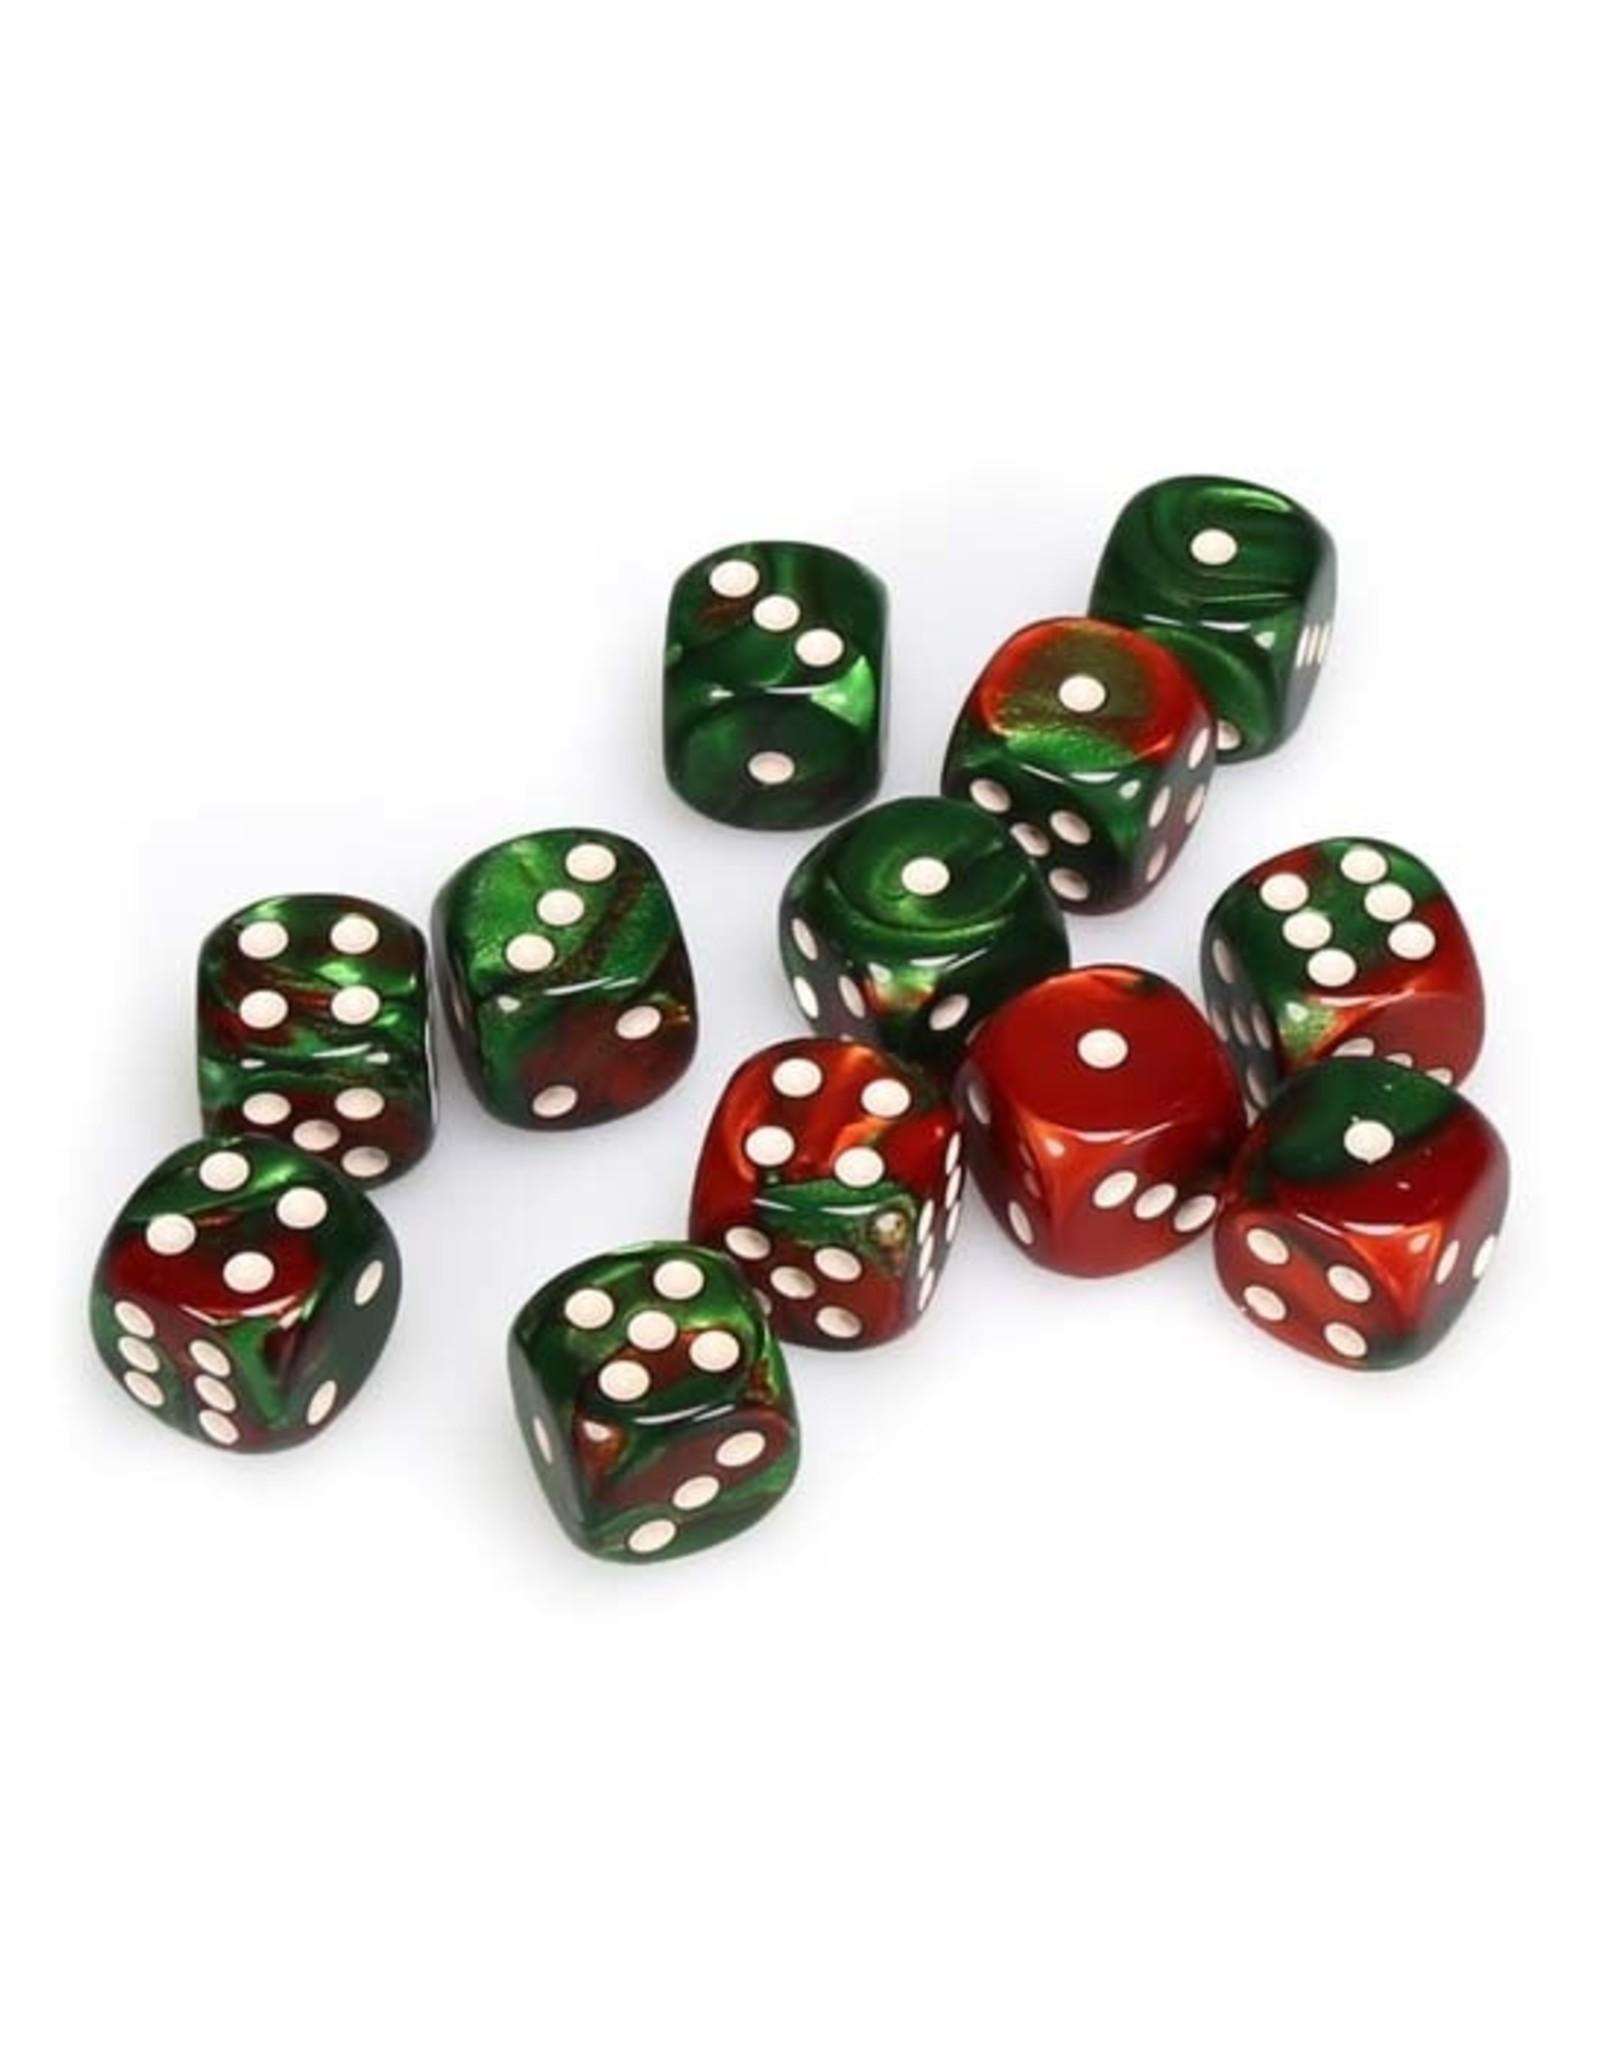 Chessex Chessex: 16mm D6 - Gemini - Green-Red w/ White